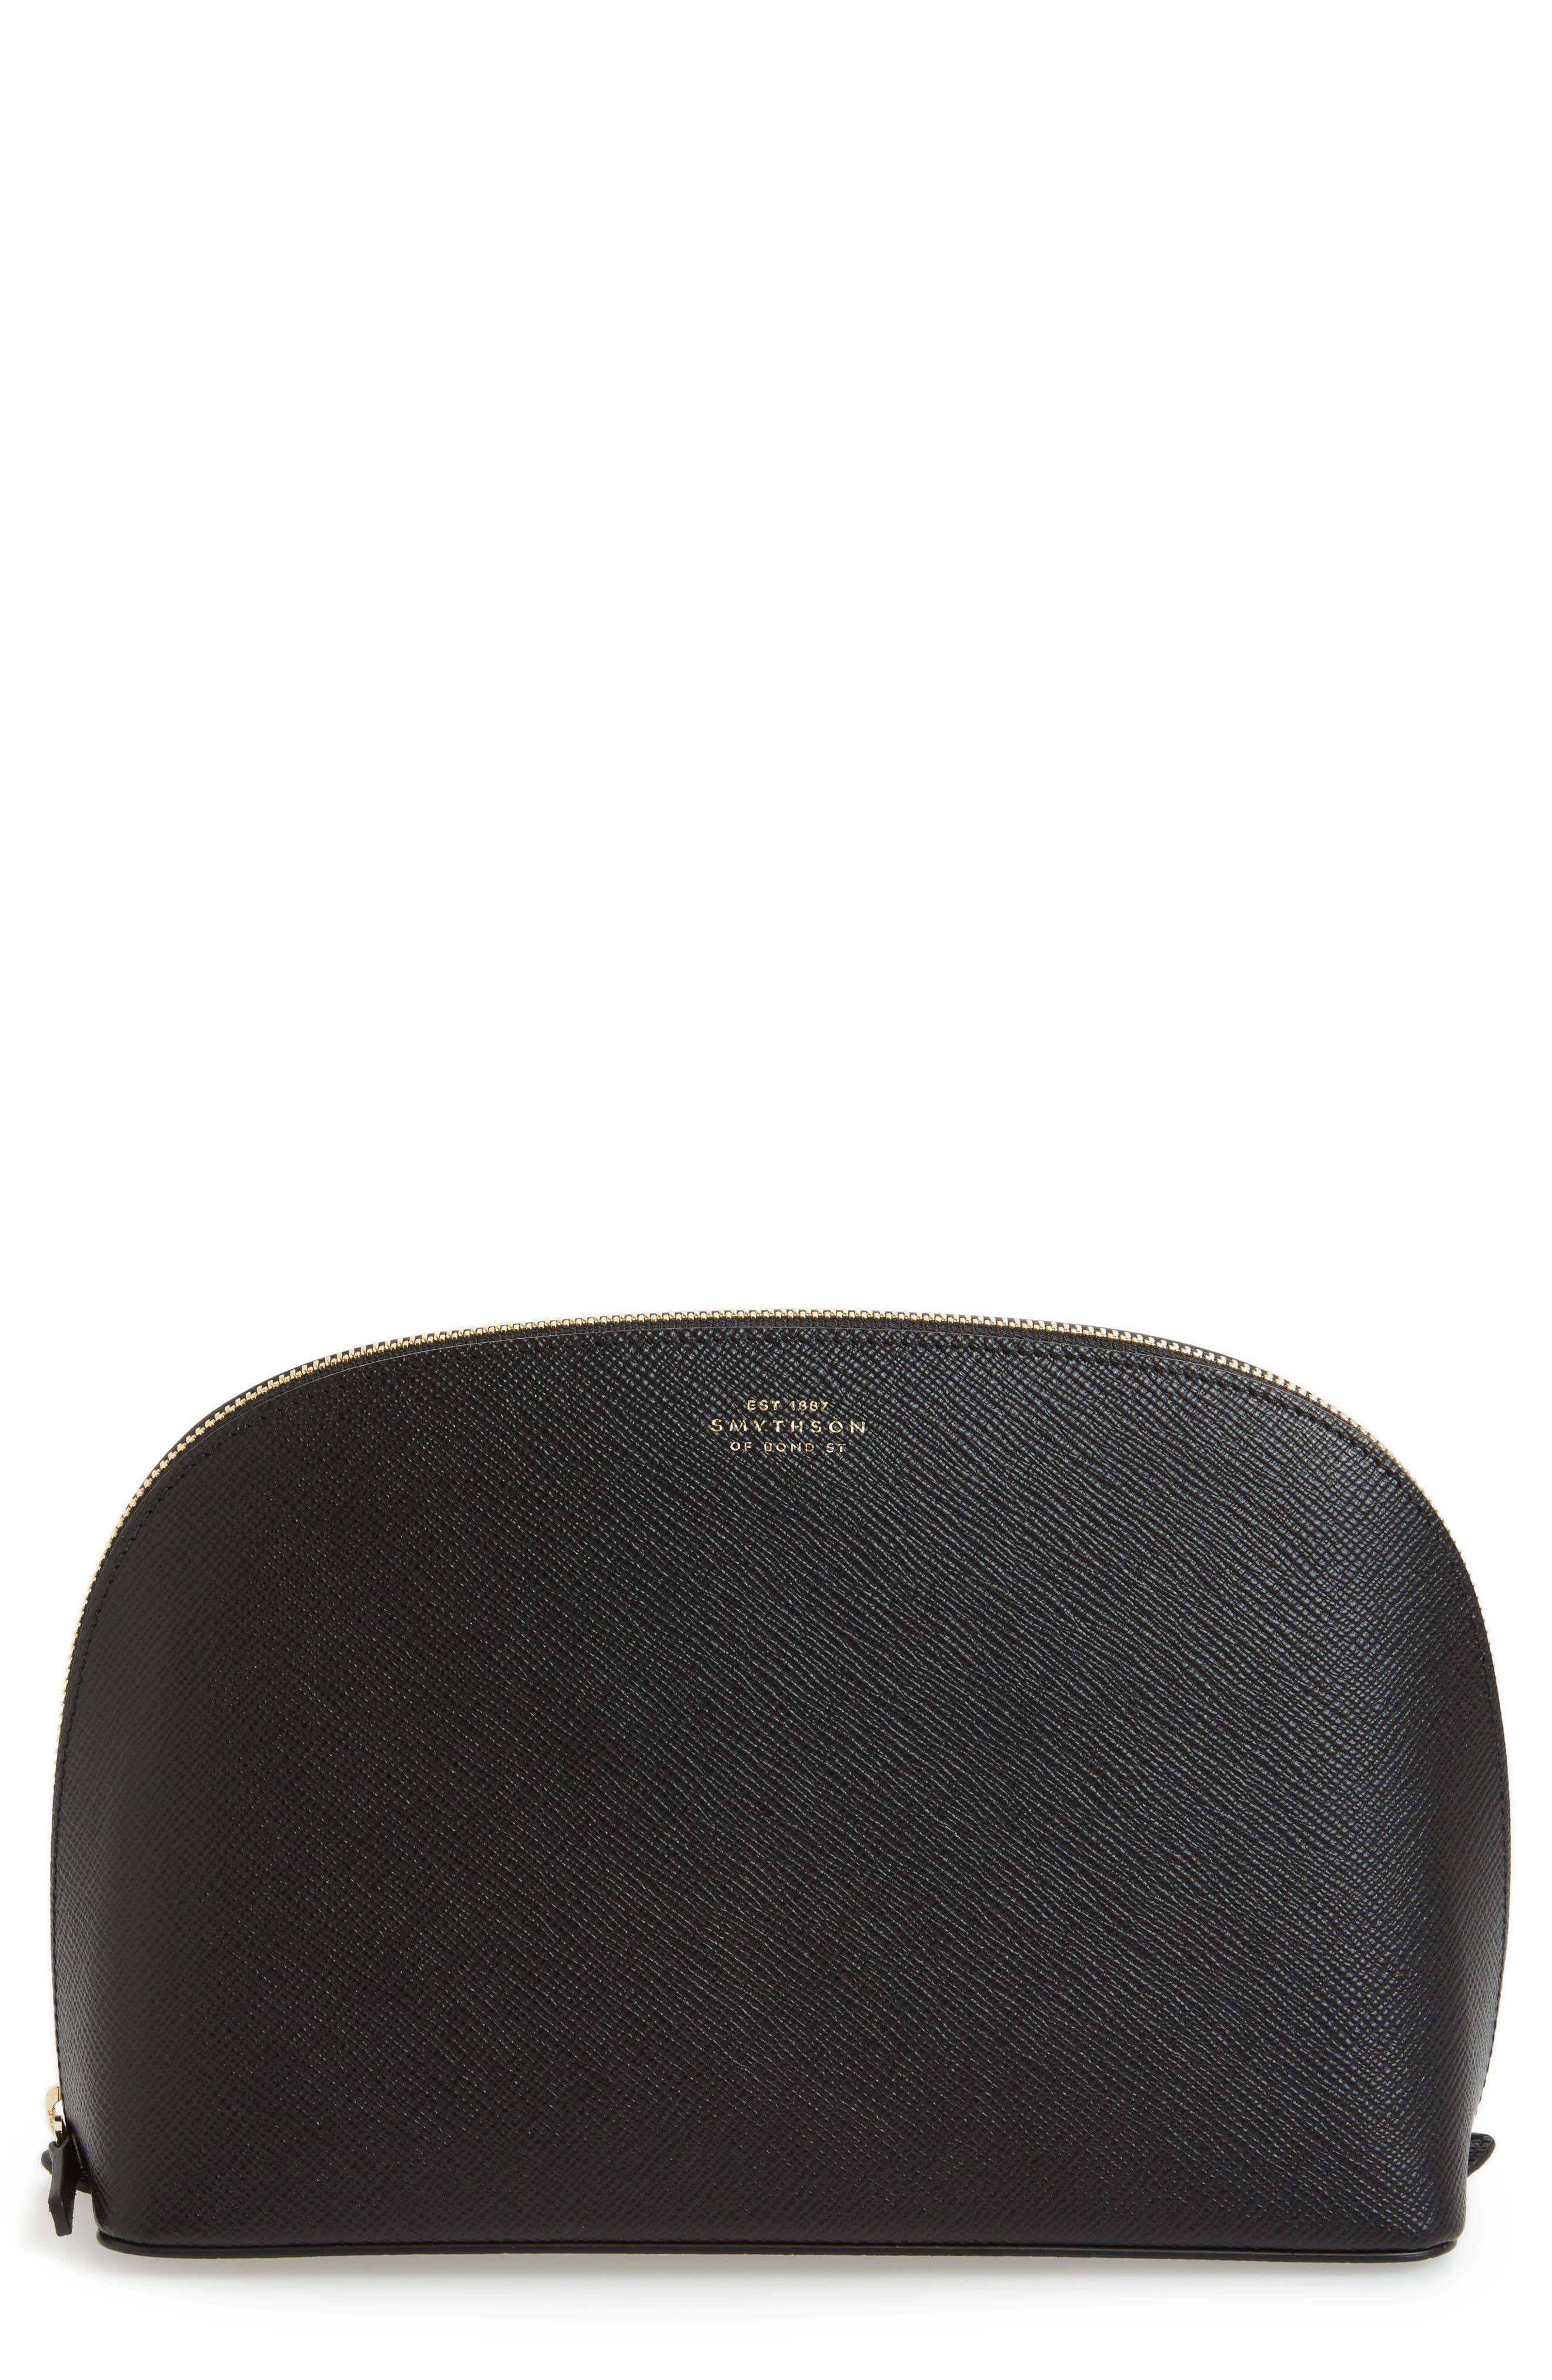 Medium Leather Cosmetics Bag,                             Main thumbnail 1, color,                             BLACK